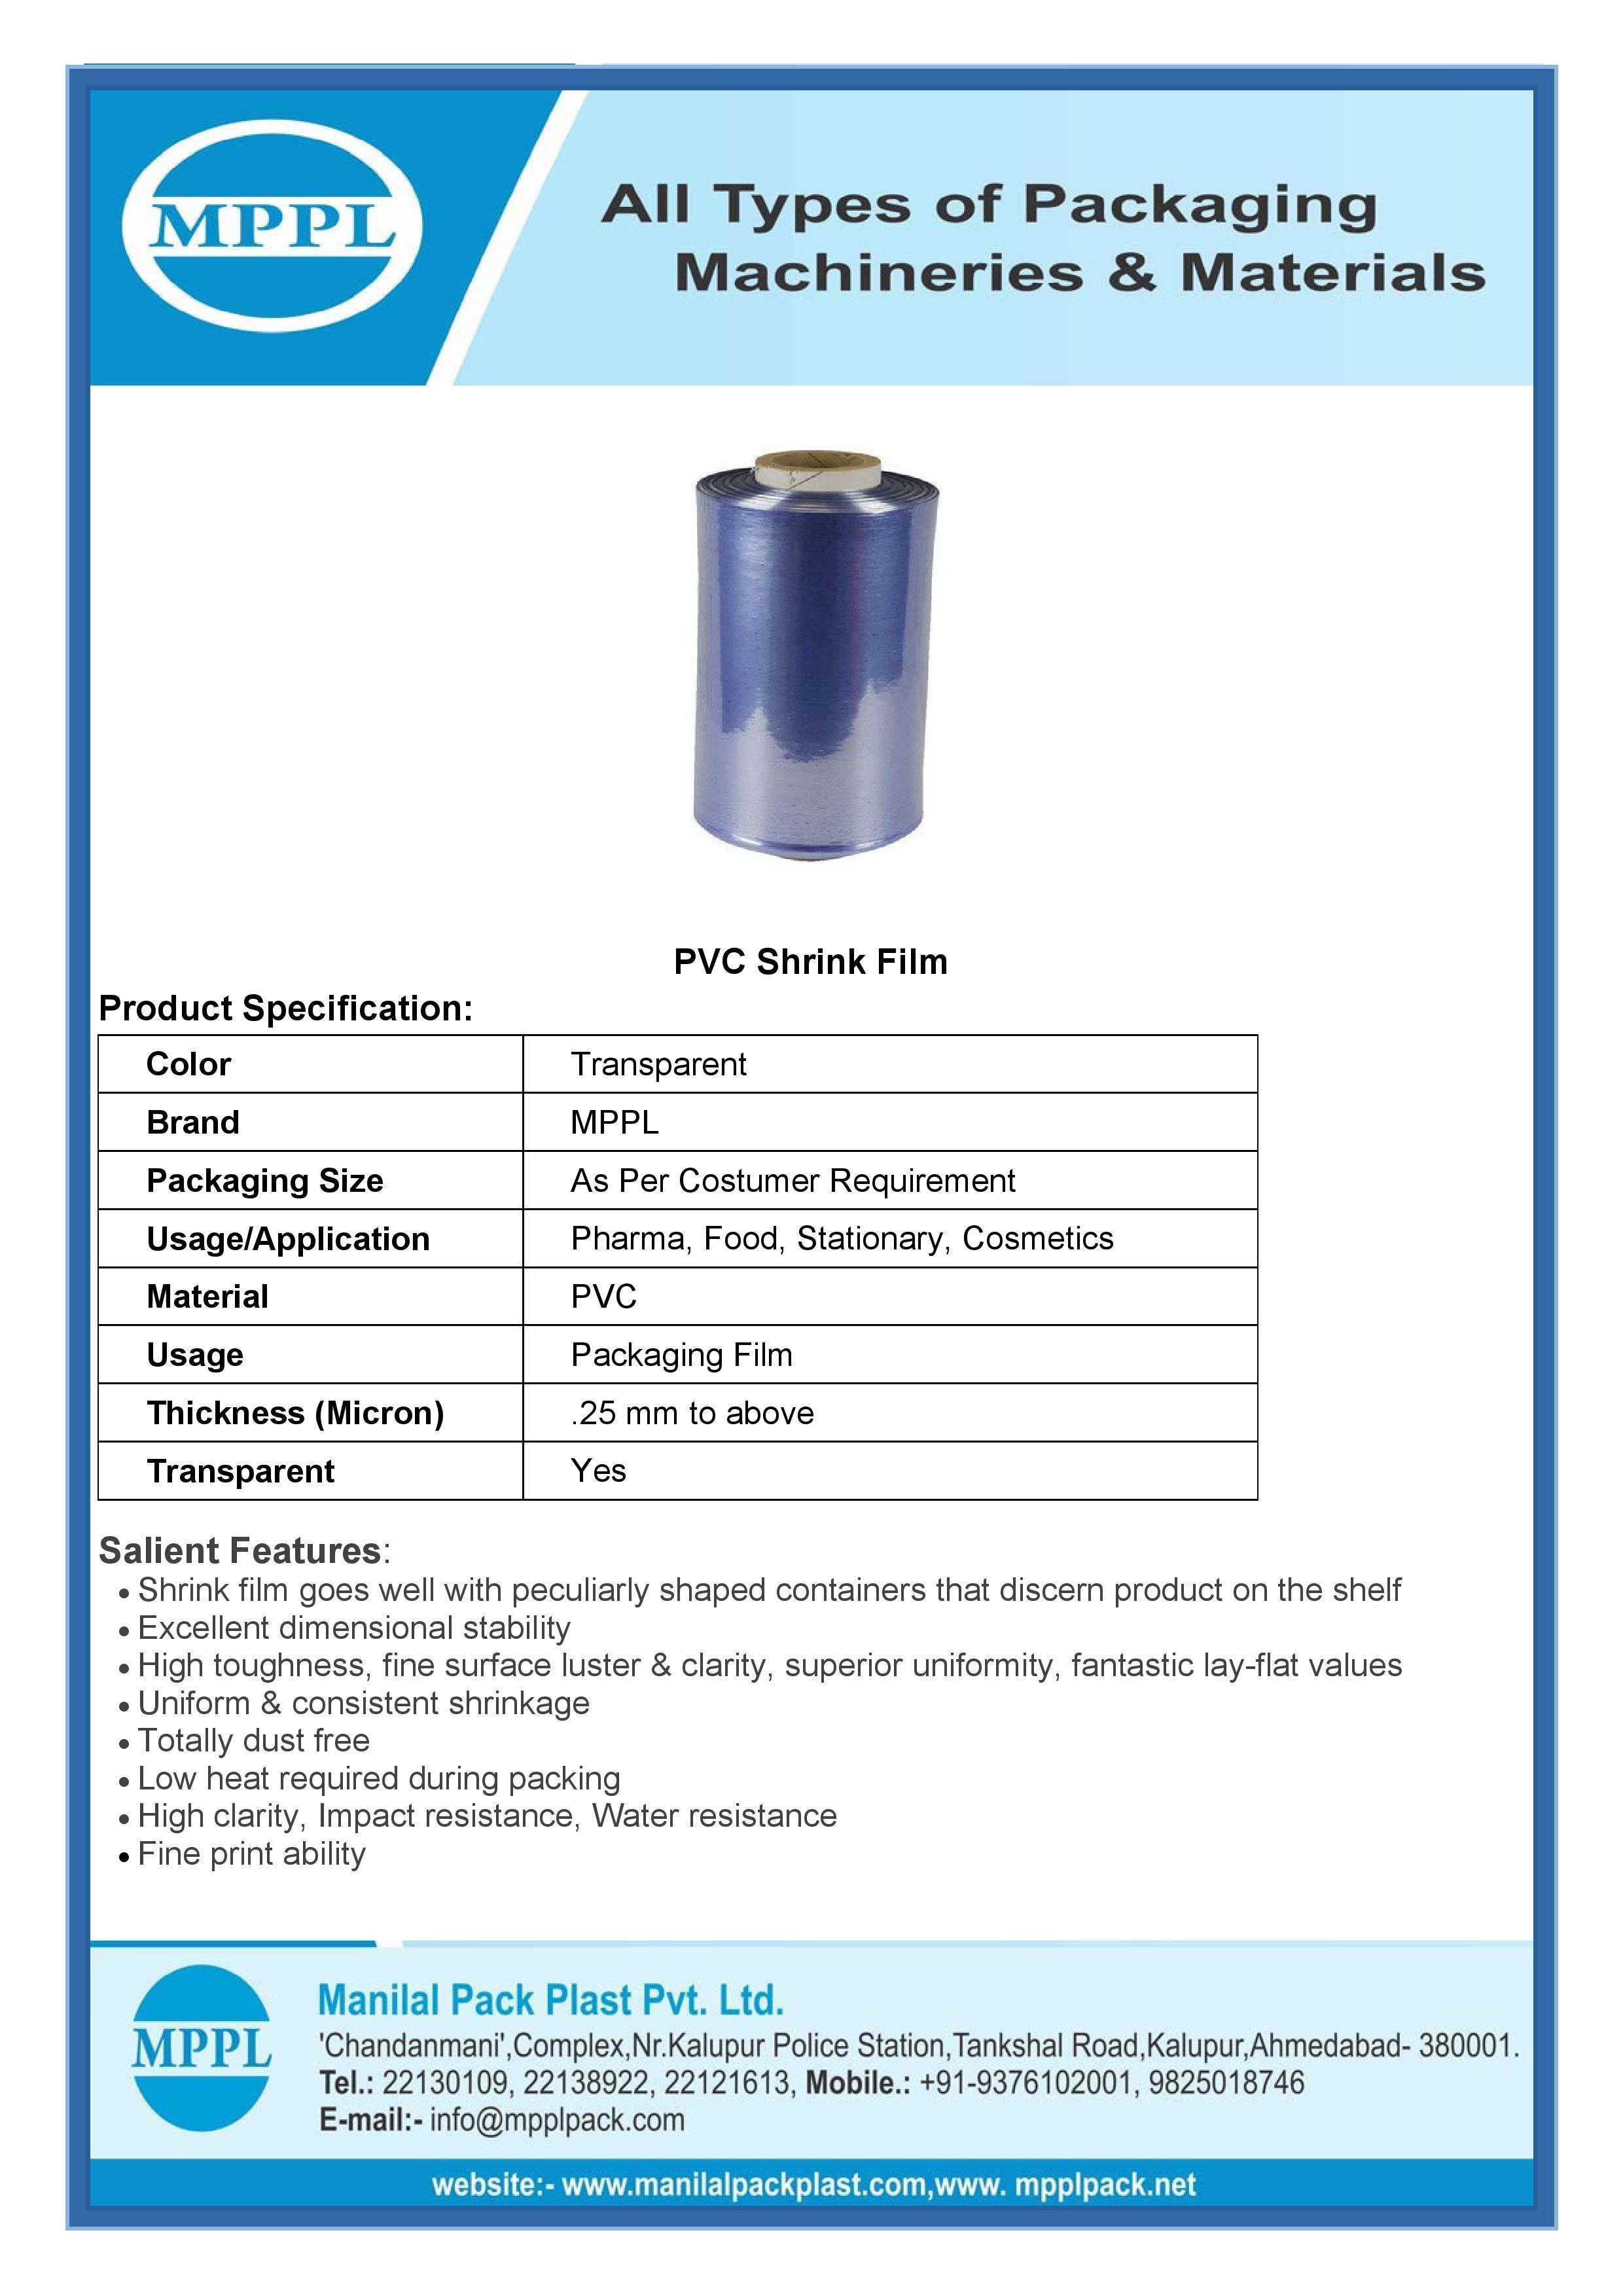 PVC Shrink Film